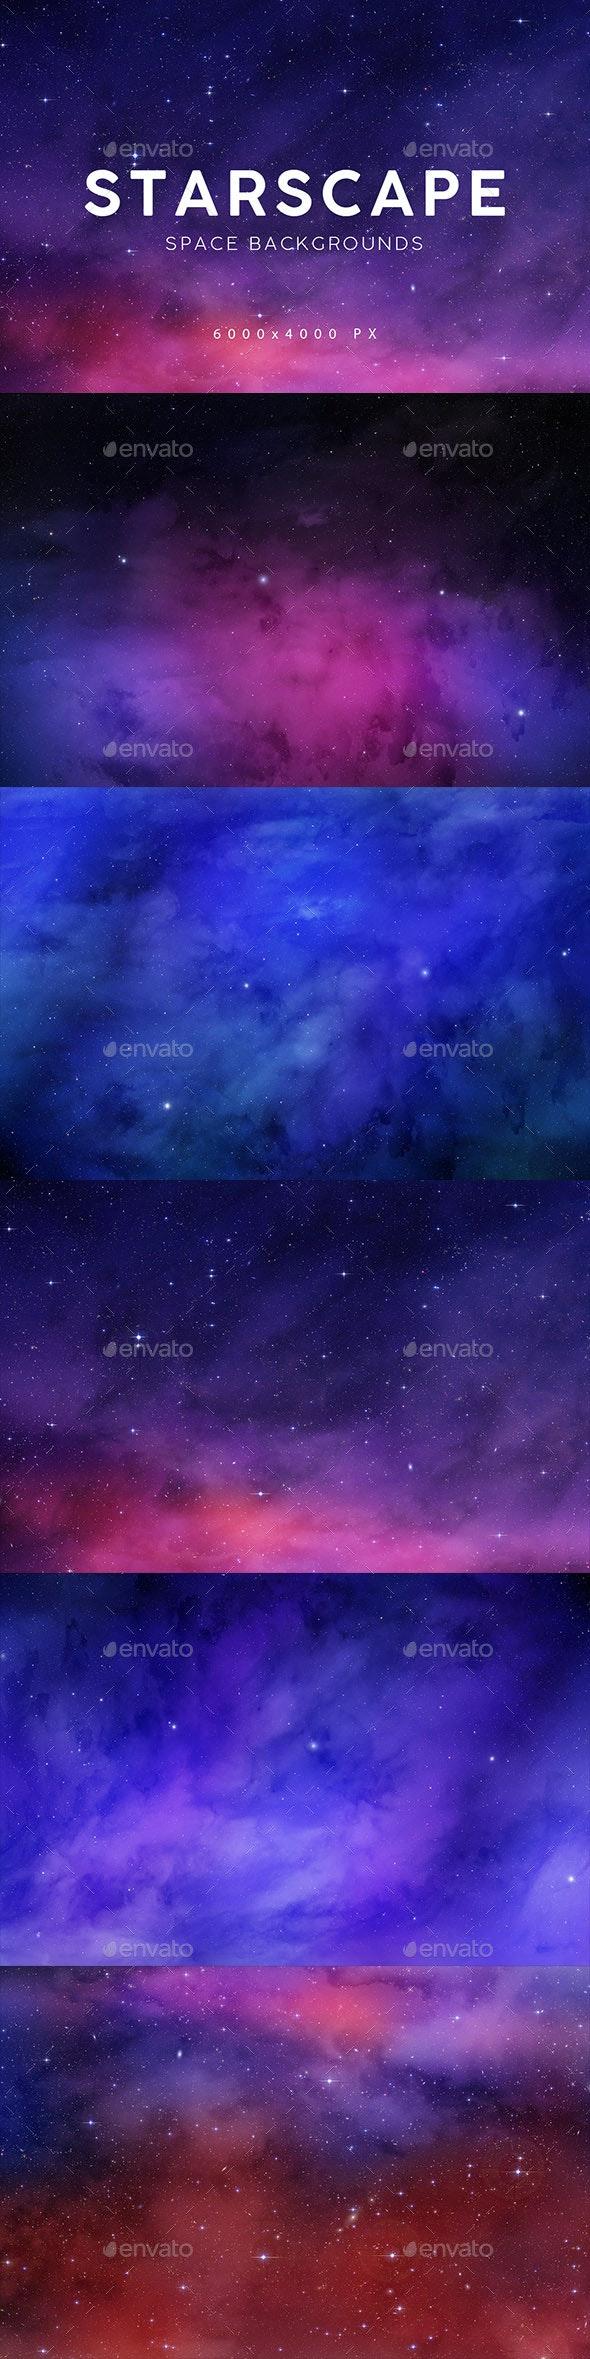 Starscape Backgrounds 2 - Tech / Futuristic Backgrounds